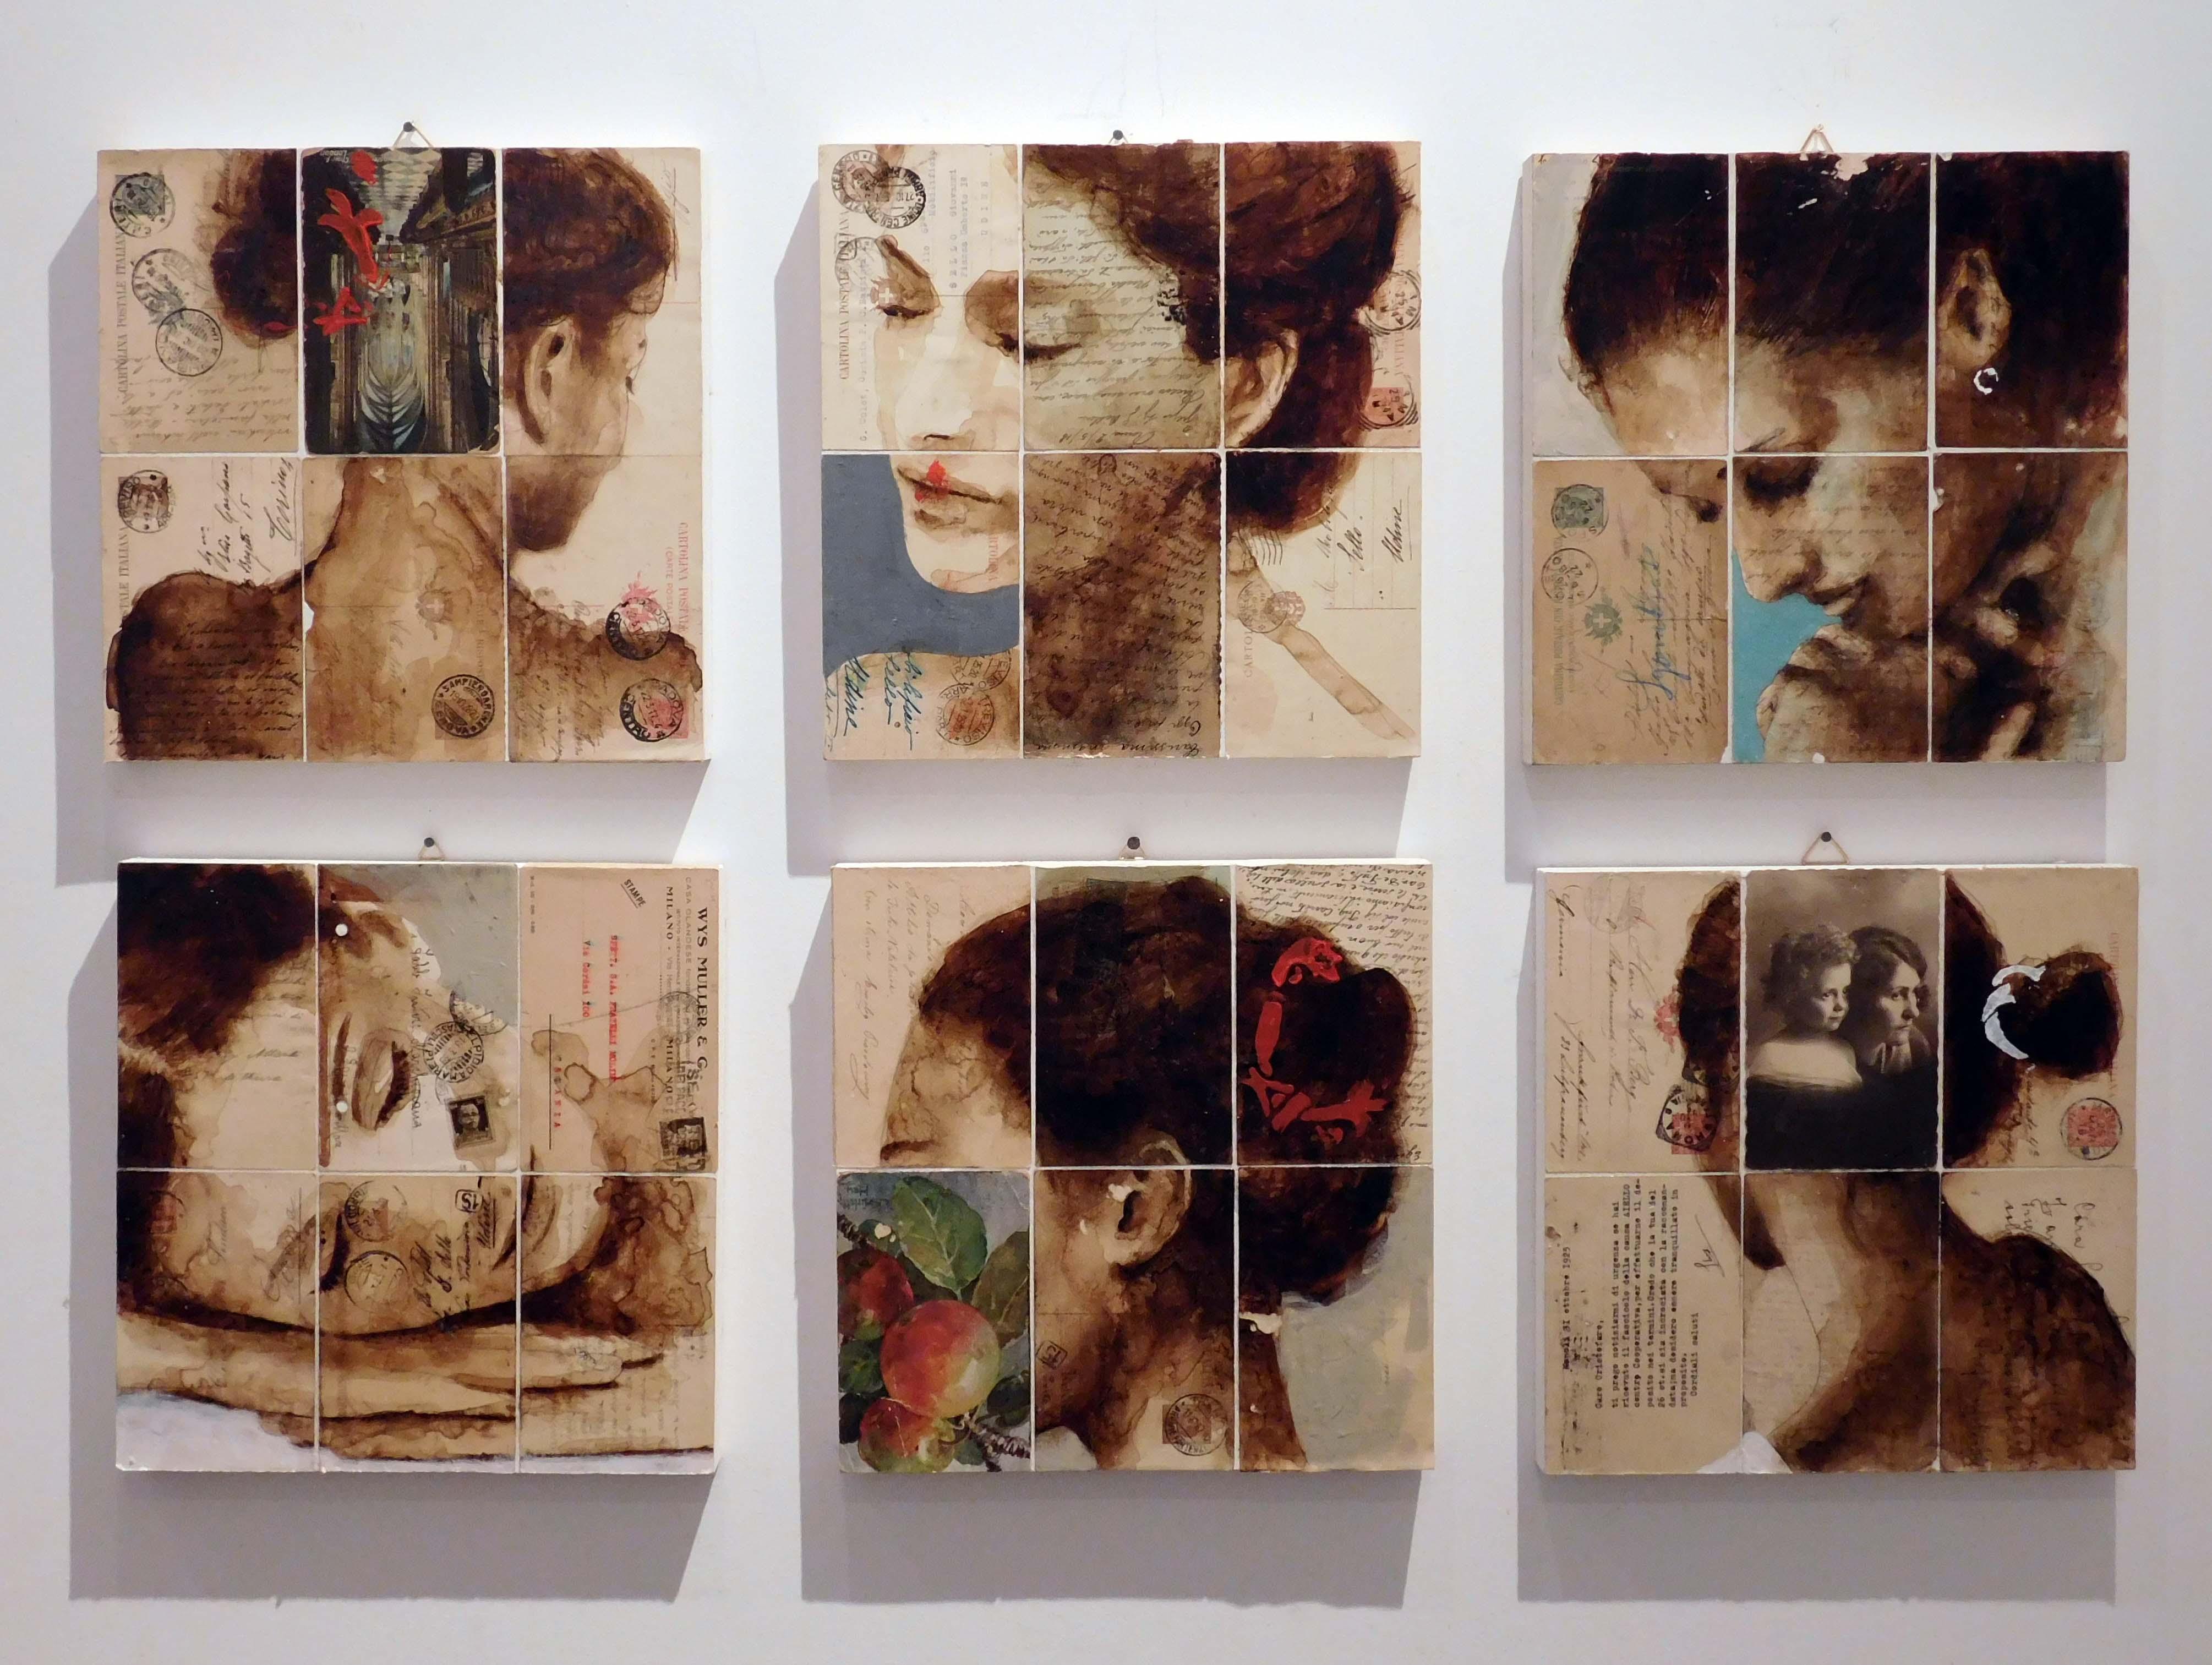 Fabio Imperiale RvB Arts Gallery